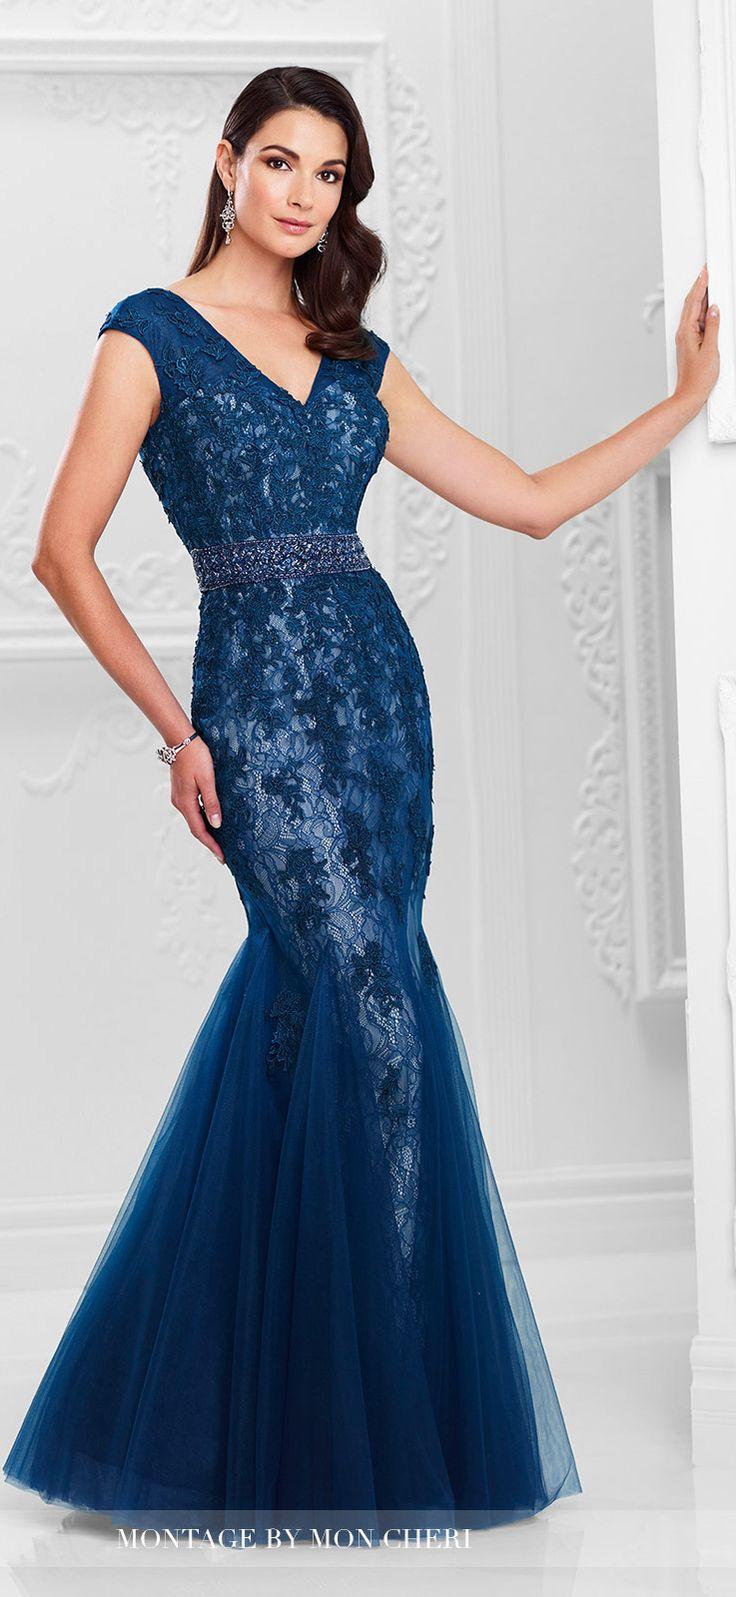 Evening Dress by Mon Cheri Bridals Spring 2017   Wedding Guest Look